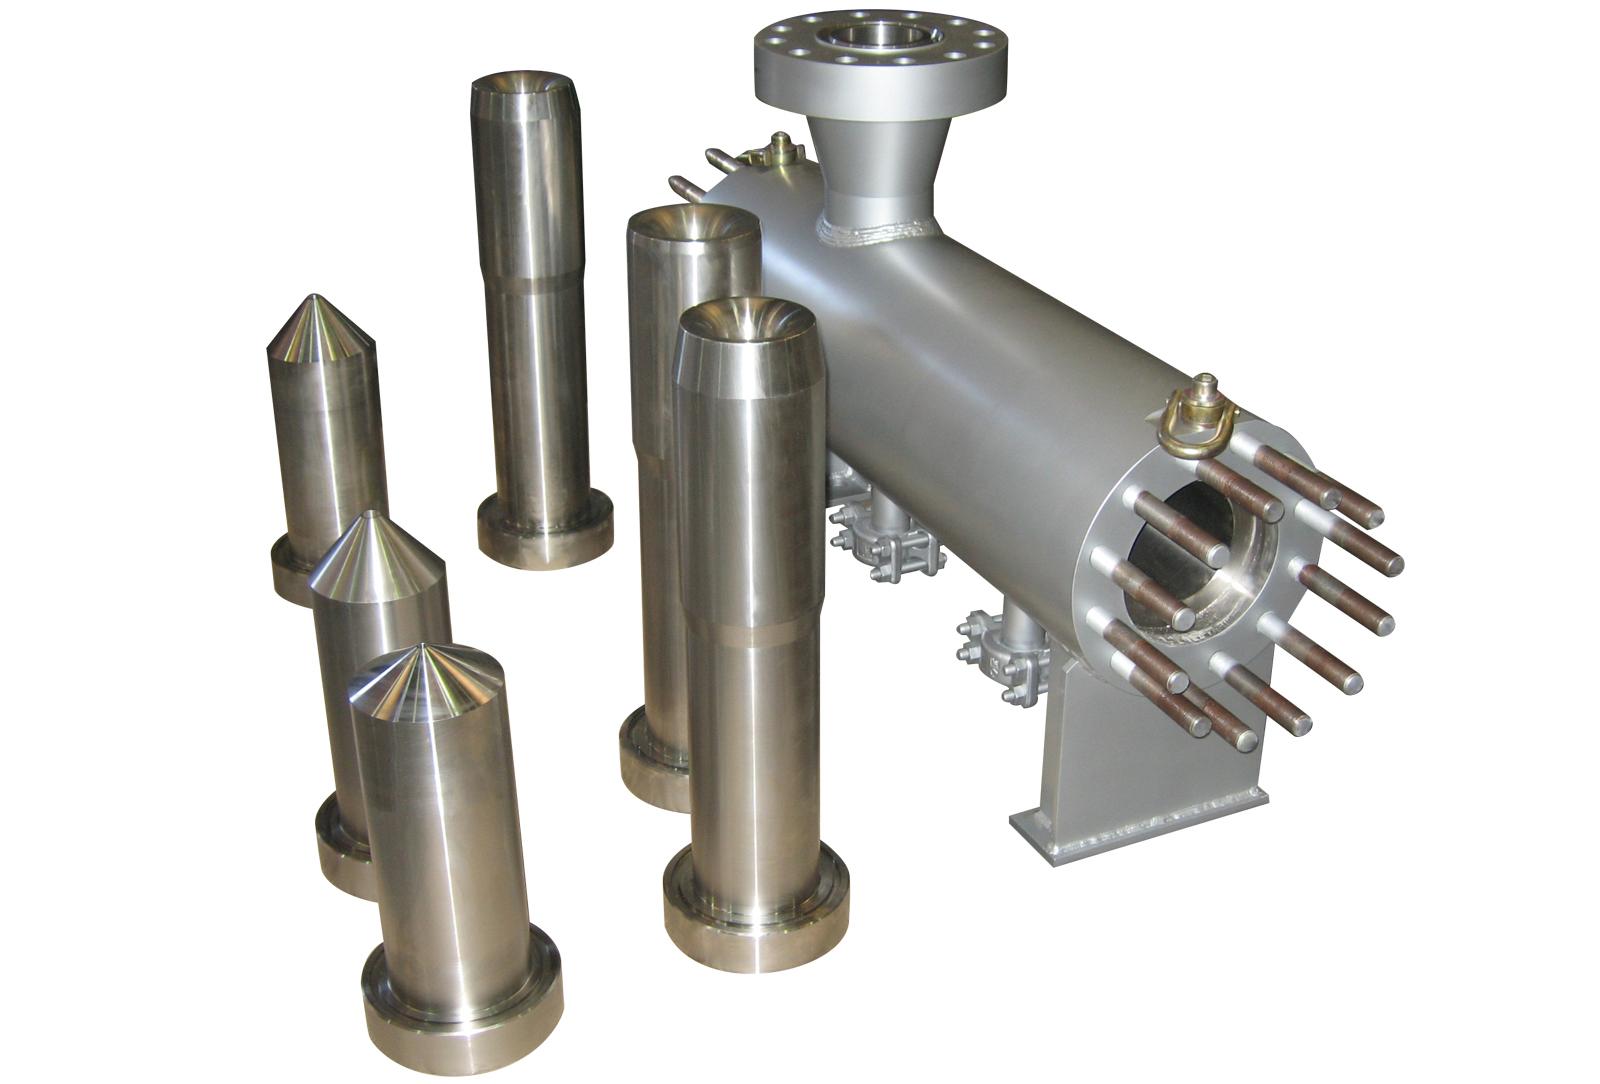 Transvac Universal Design Gas Ejector